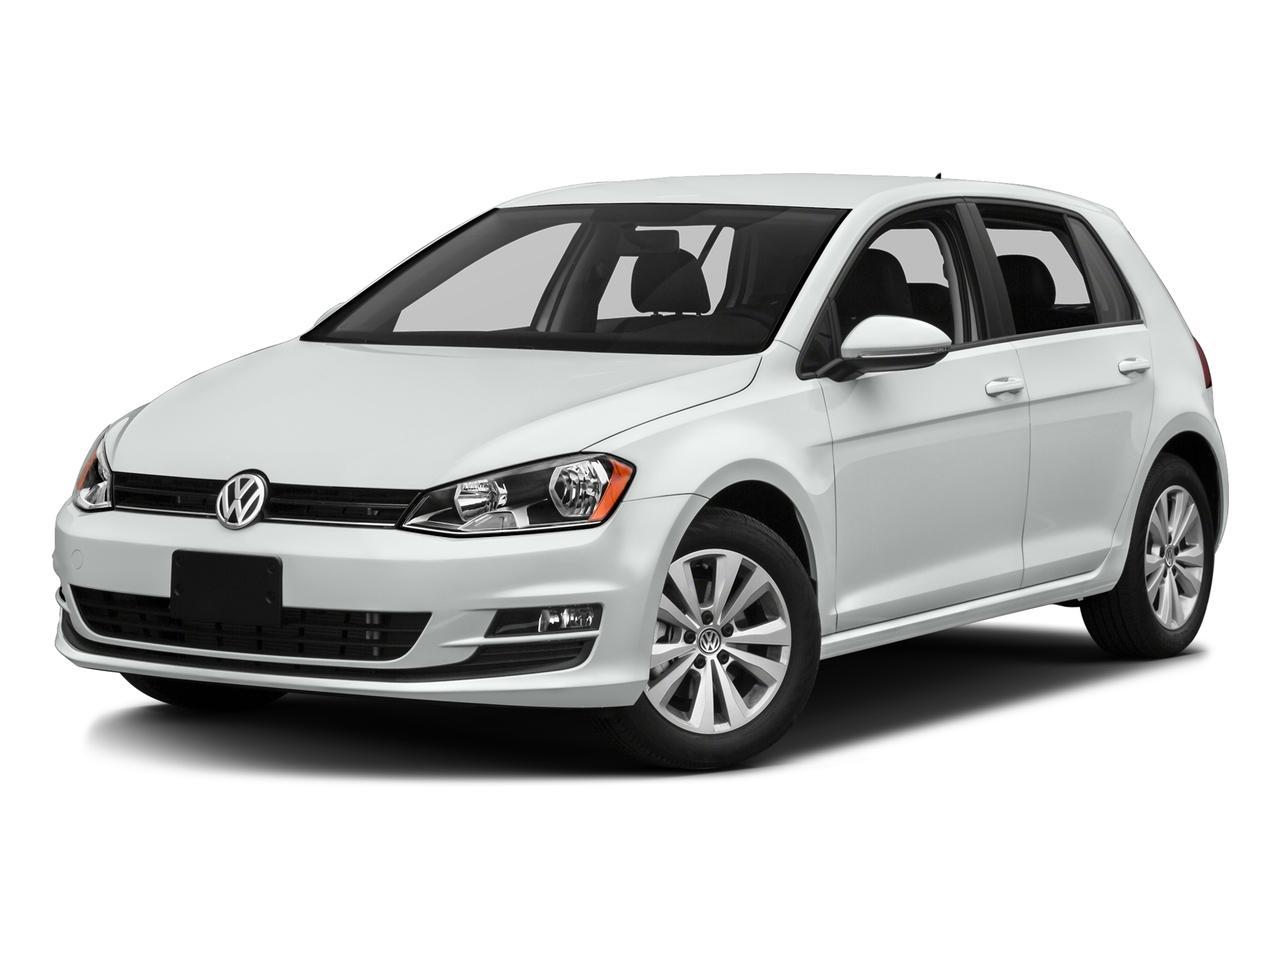 2017 Volkswagen Golf Vehicle Photo in Neenah, WI 54956